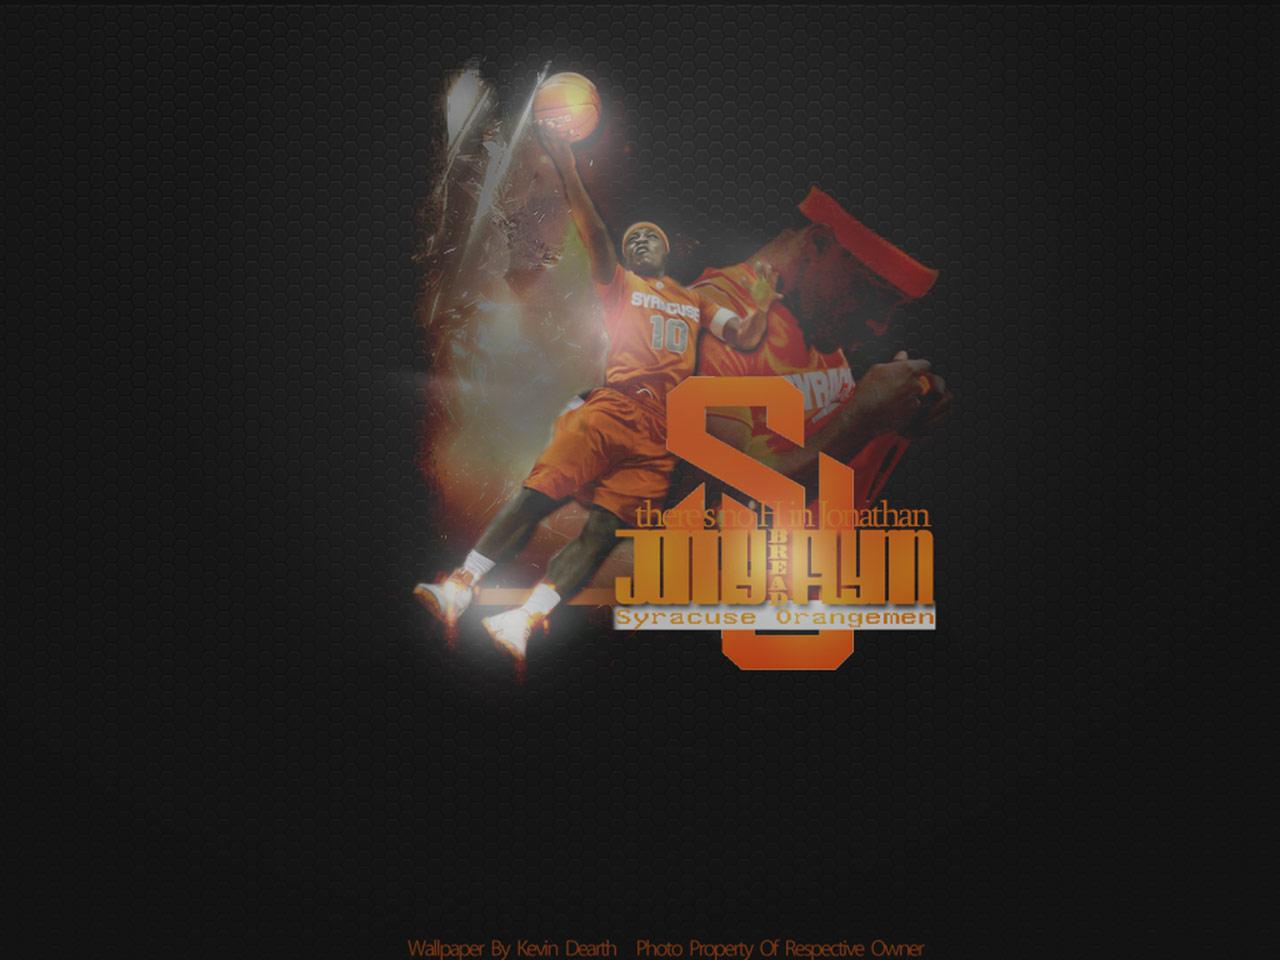 Jonny Flynn Wallpapers Ncaa Basketball 2011 1280x960